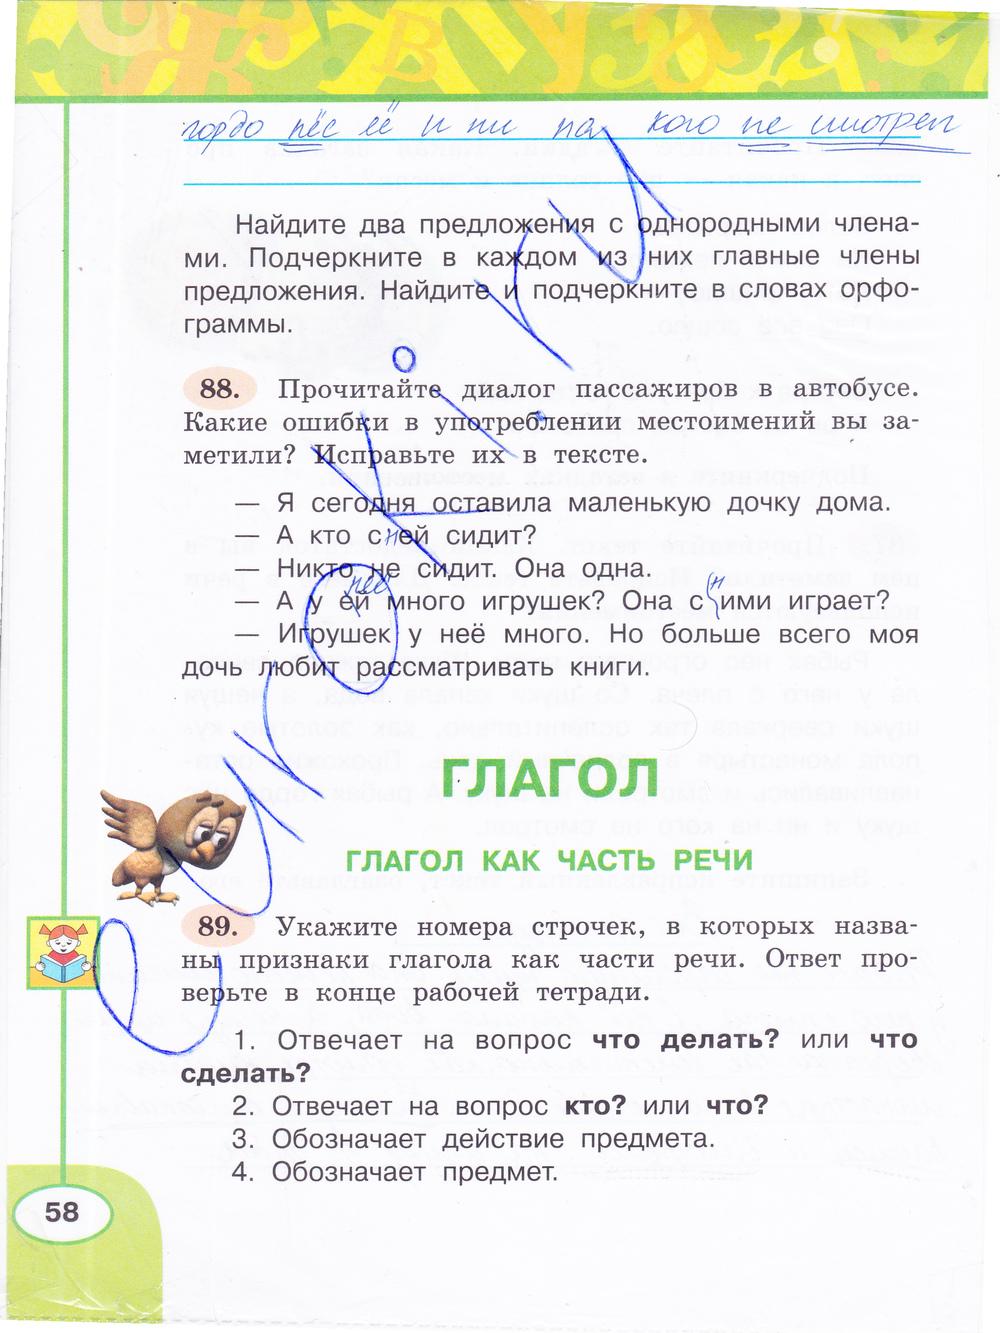 Перспектива рабочая тетрадь бабушкина решебник 4 класс климанова